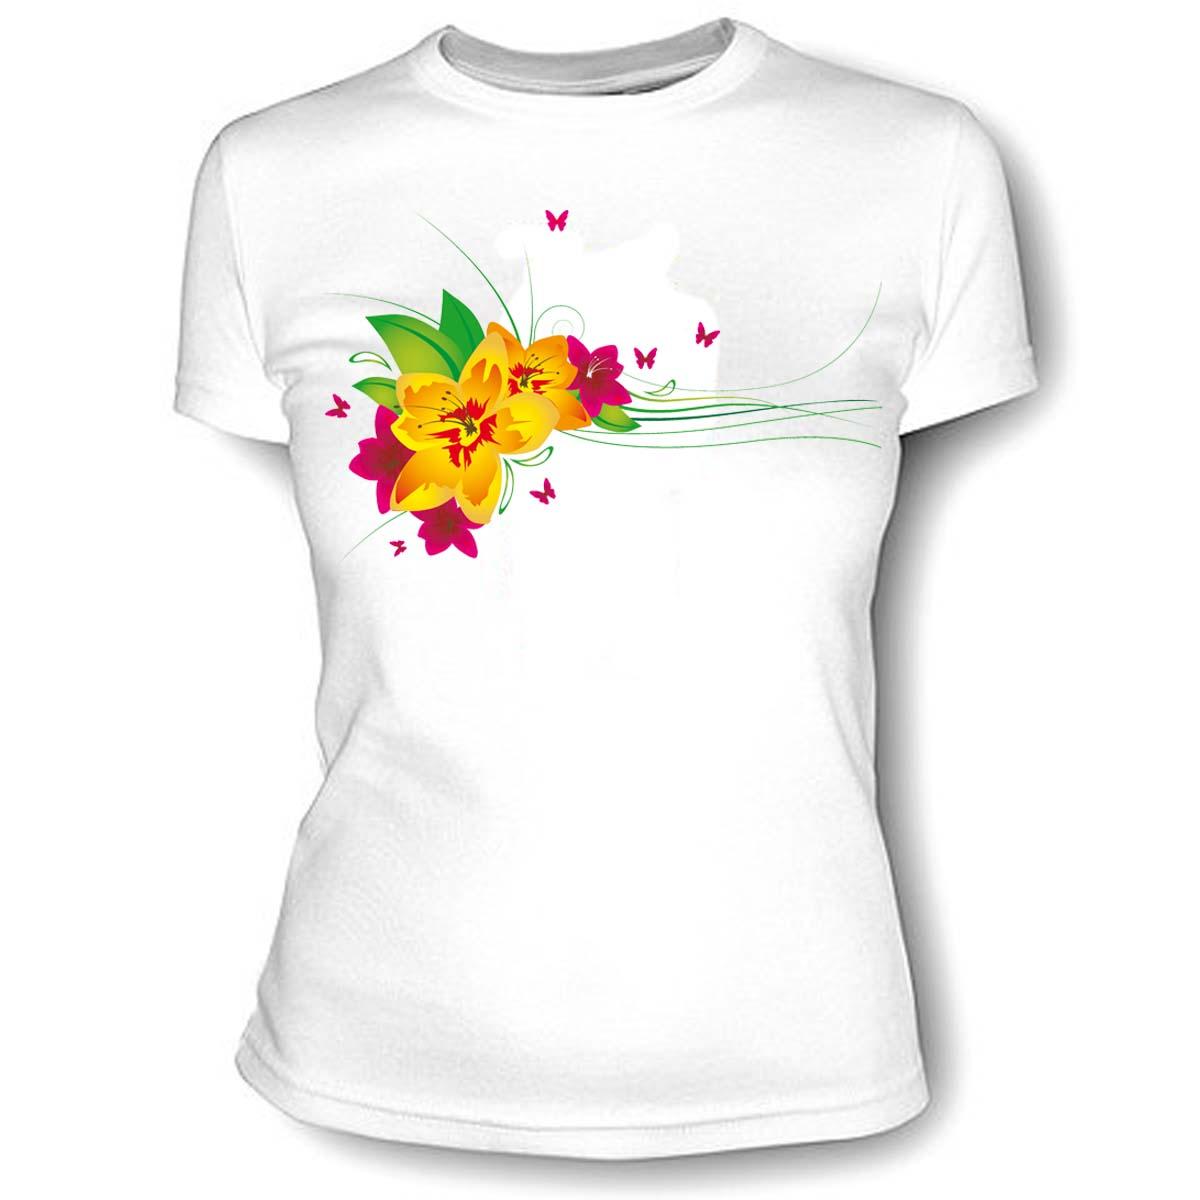 печать названий футболка